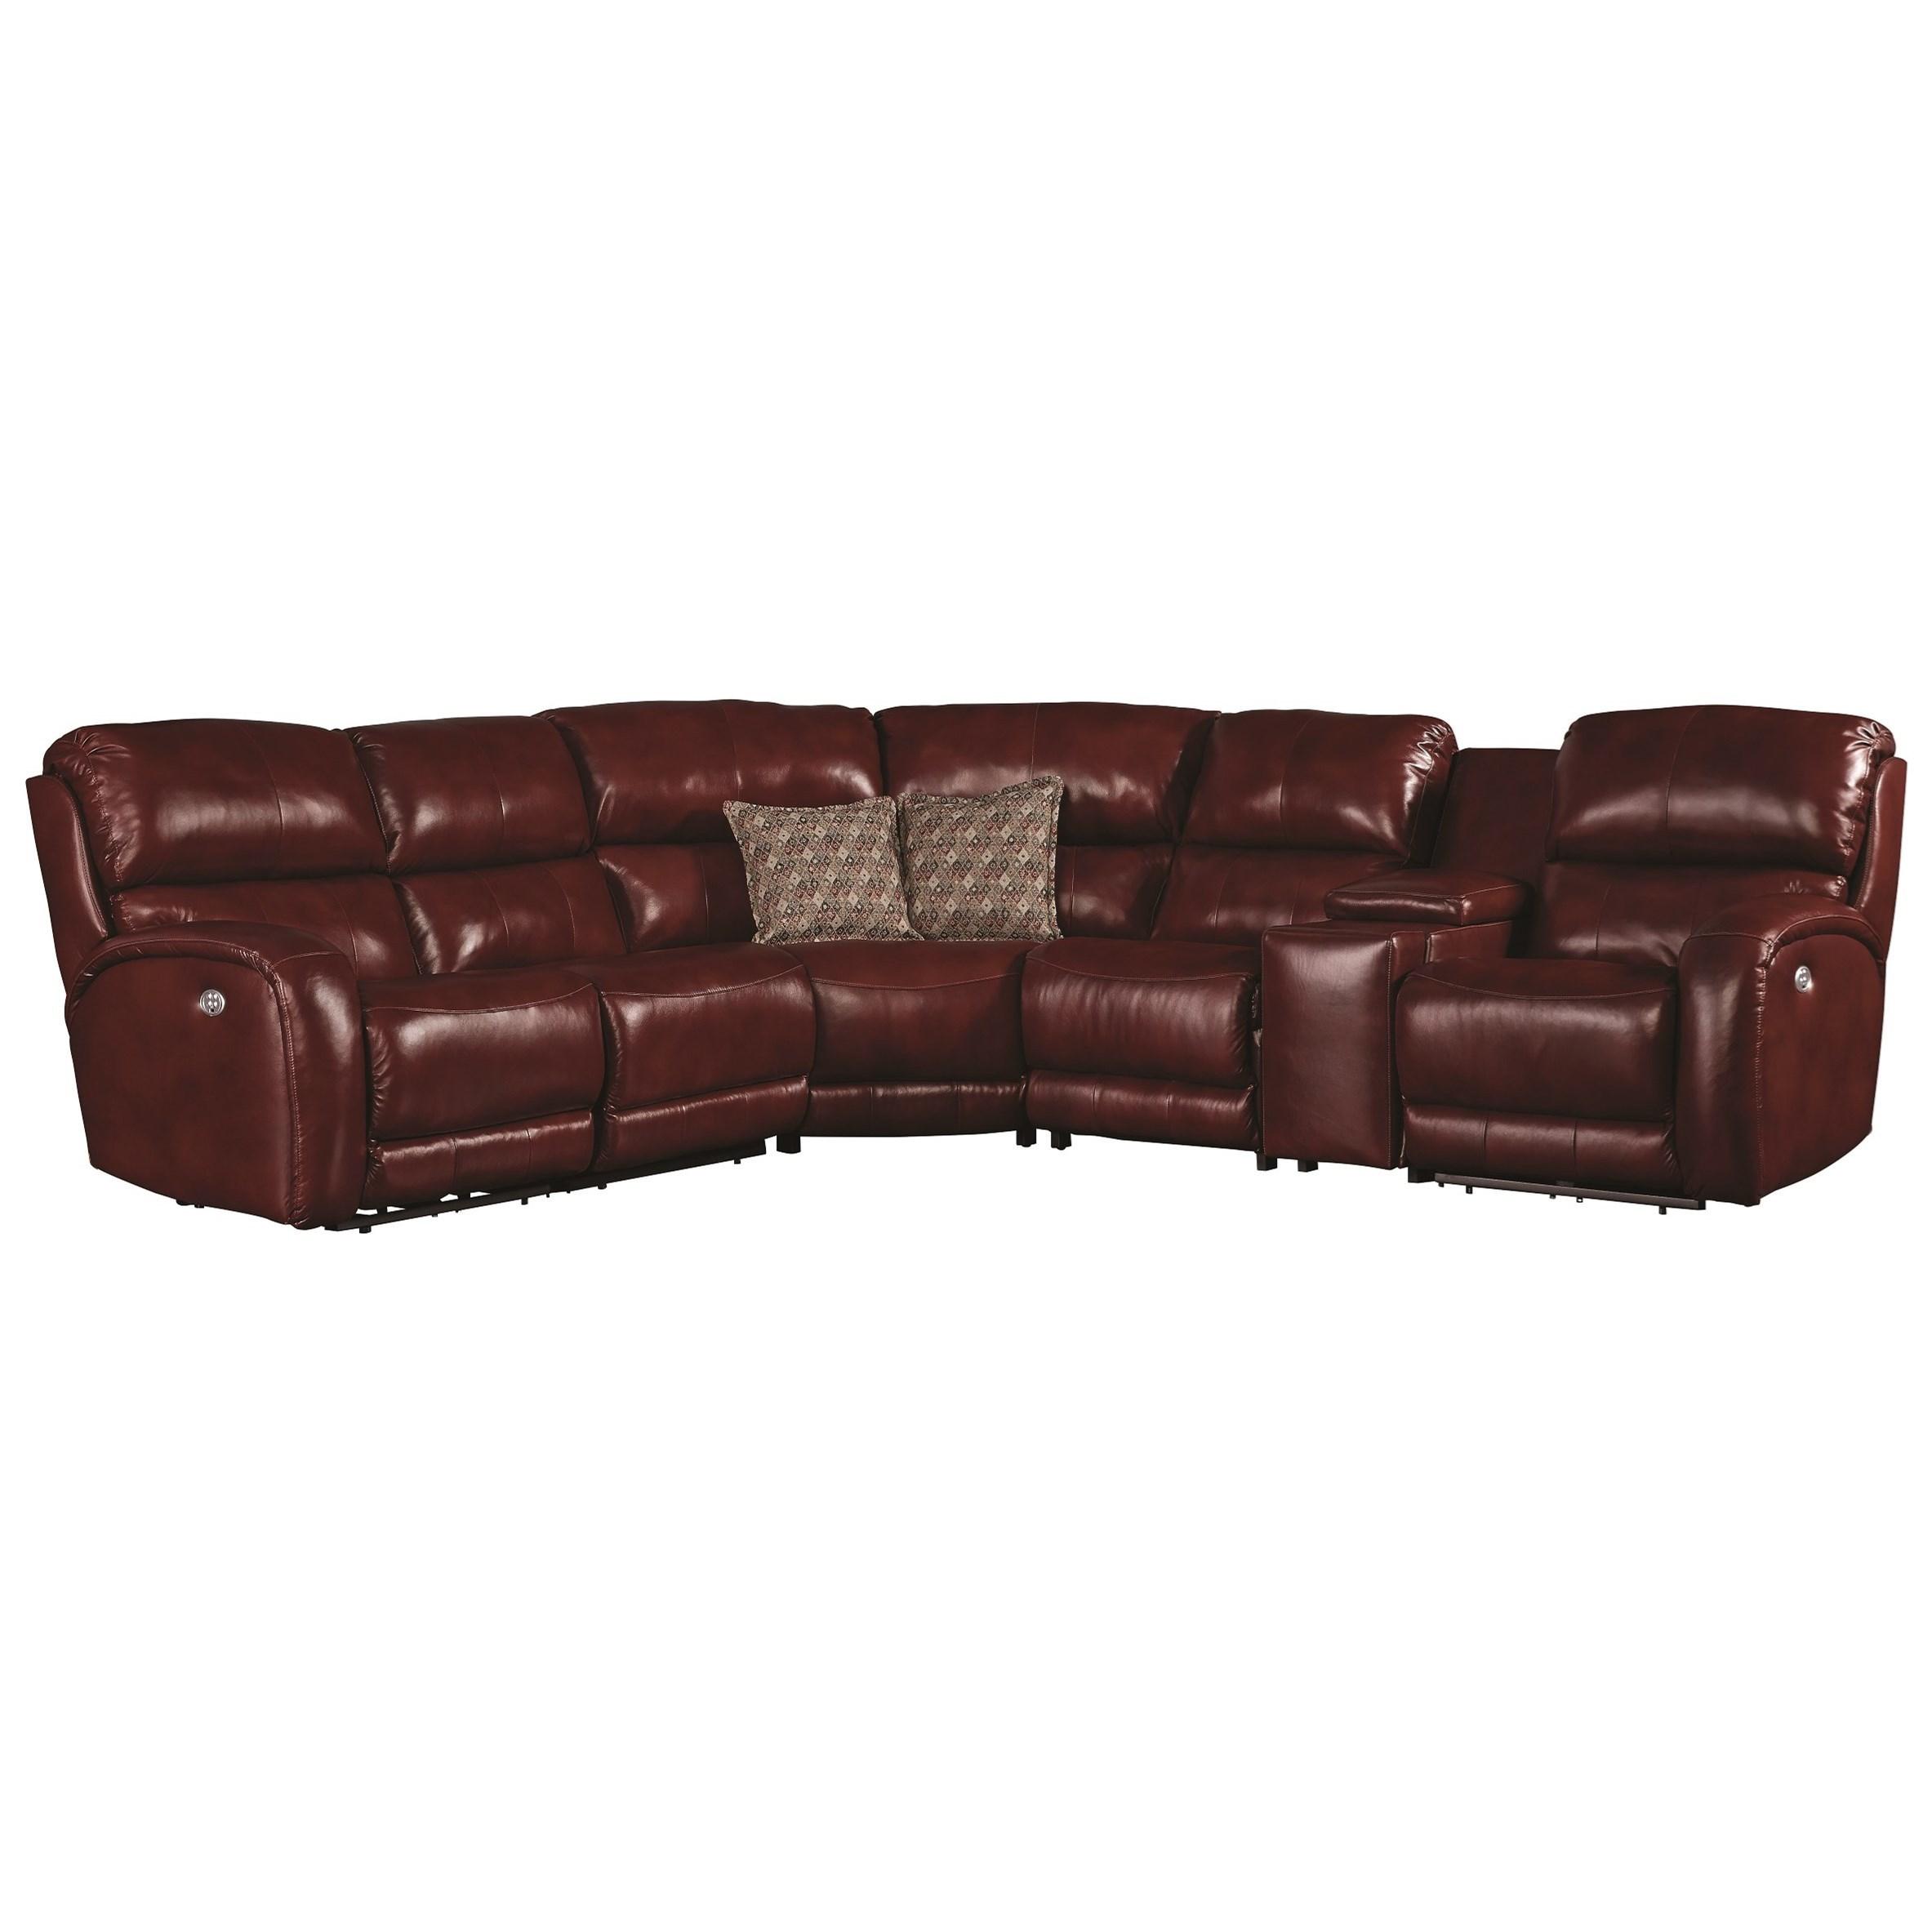 Fandango Power Reclining Sofa by Southern Motion at Suburban Furniture